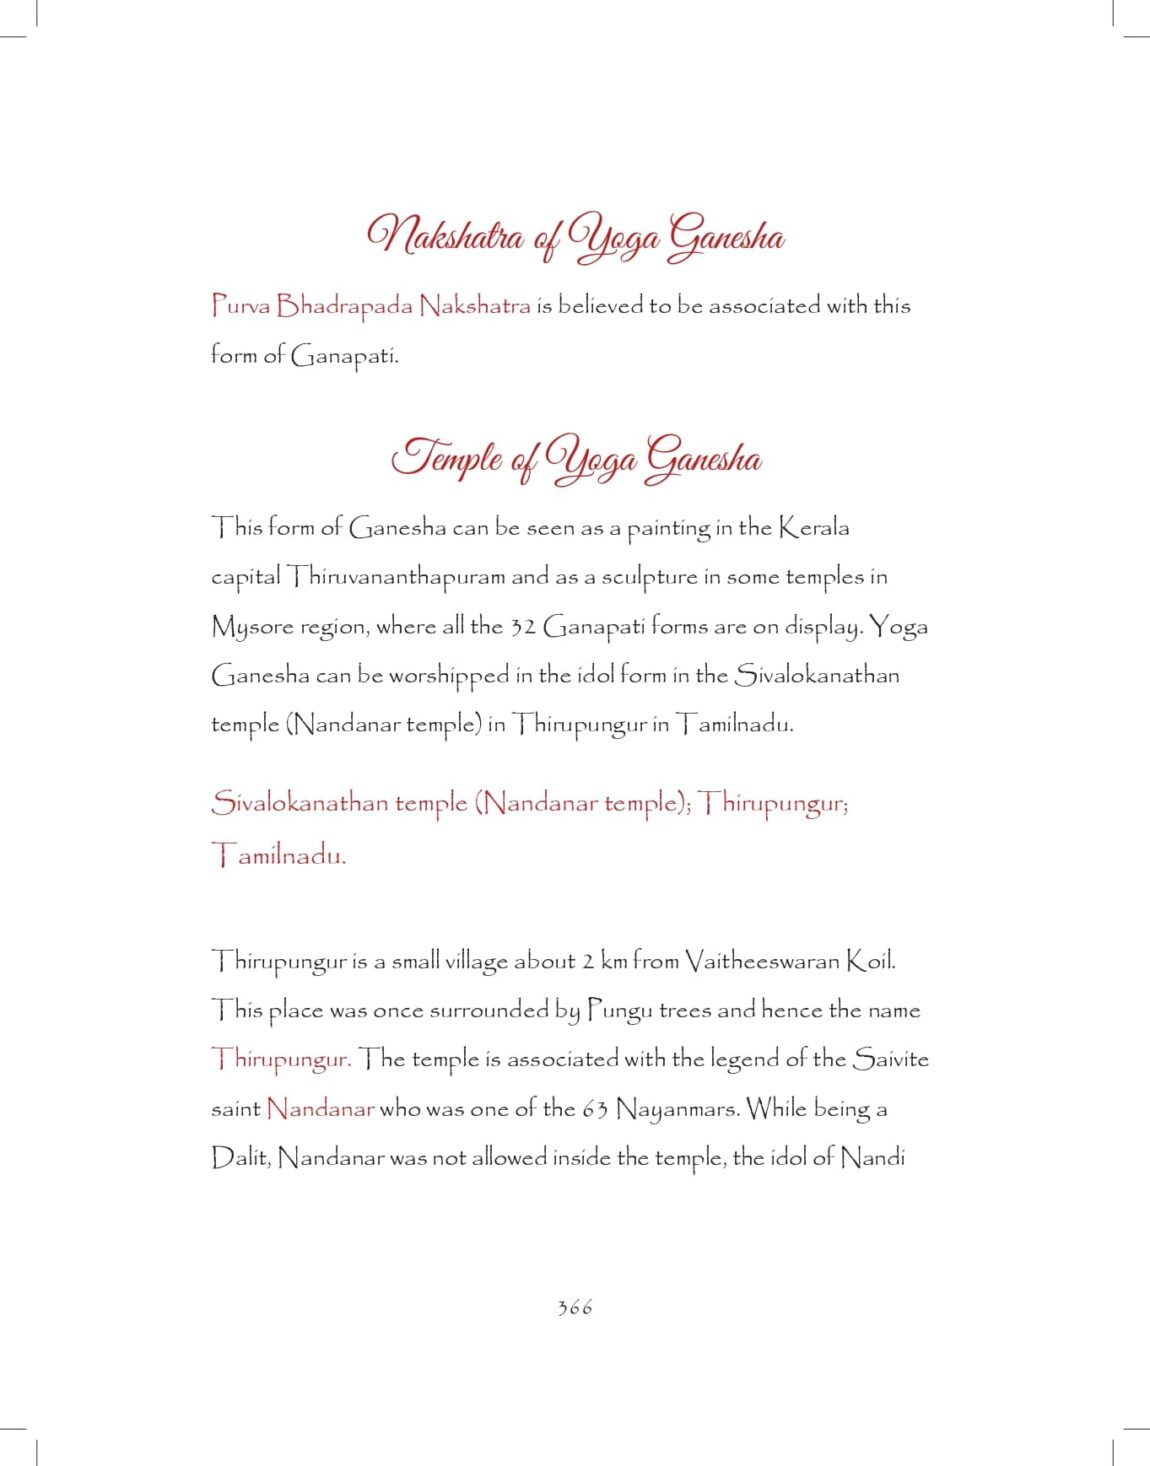 Ganesh-print_pages-to-jpg-0366.jpg